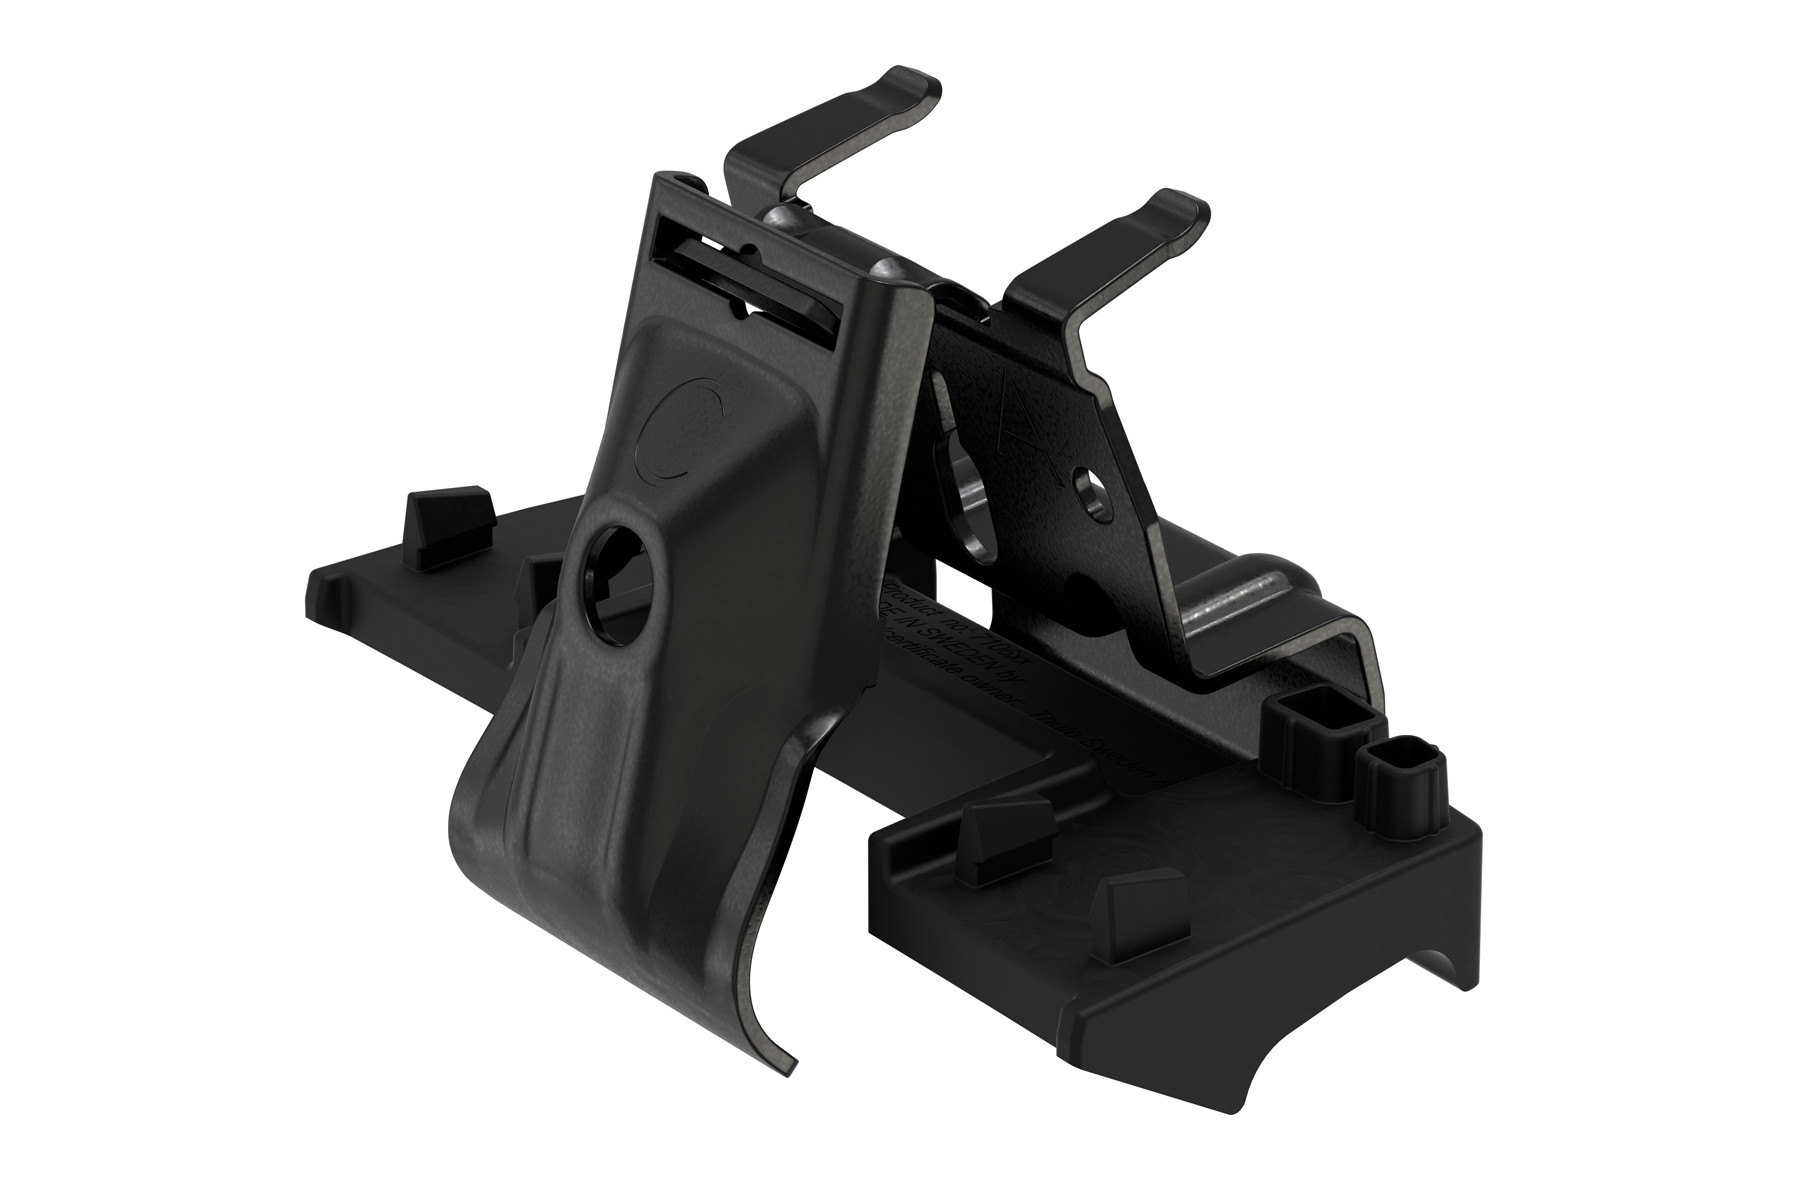 Thule 186000 Series Fitting Kits